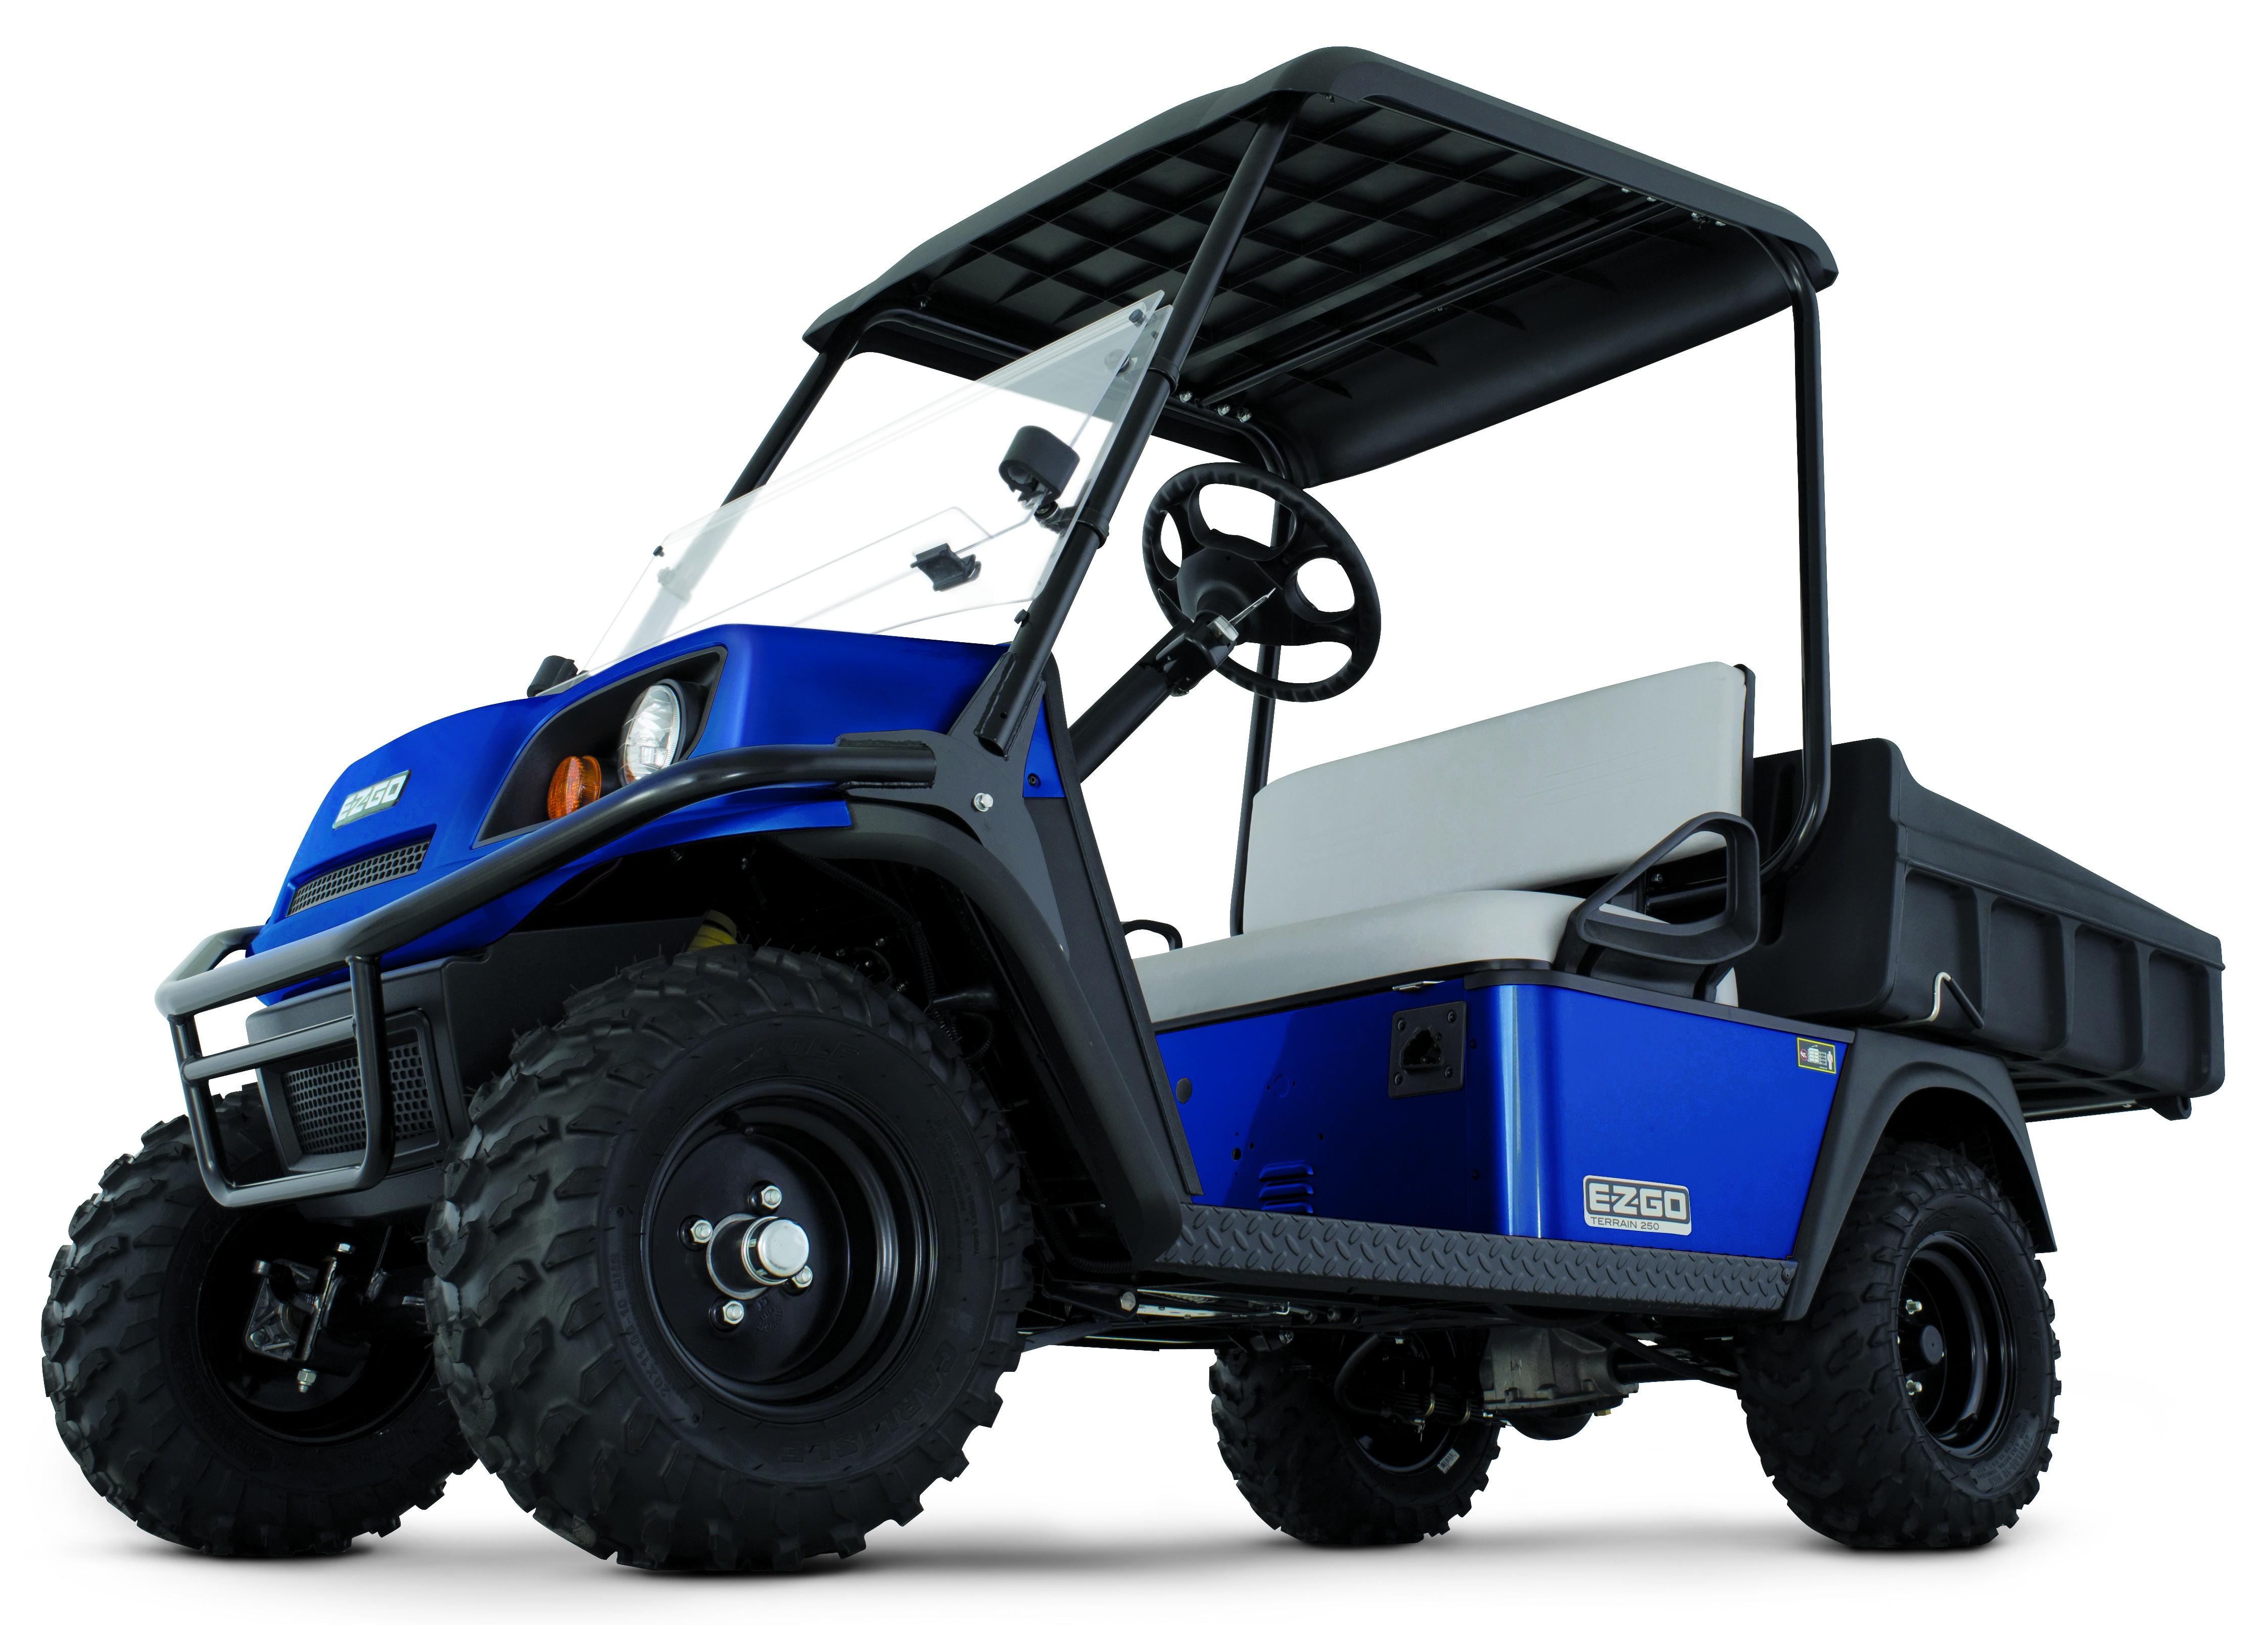 ez go rj11 wall jack wiring diagram what year is my ezgo golf cart tire supply terrain 01 jpg